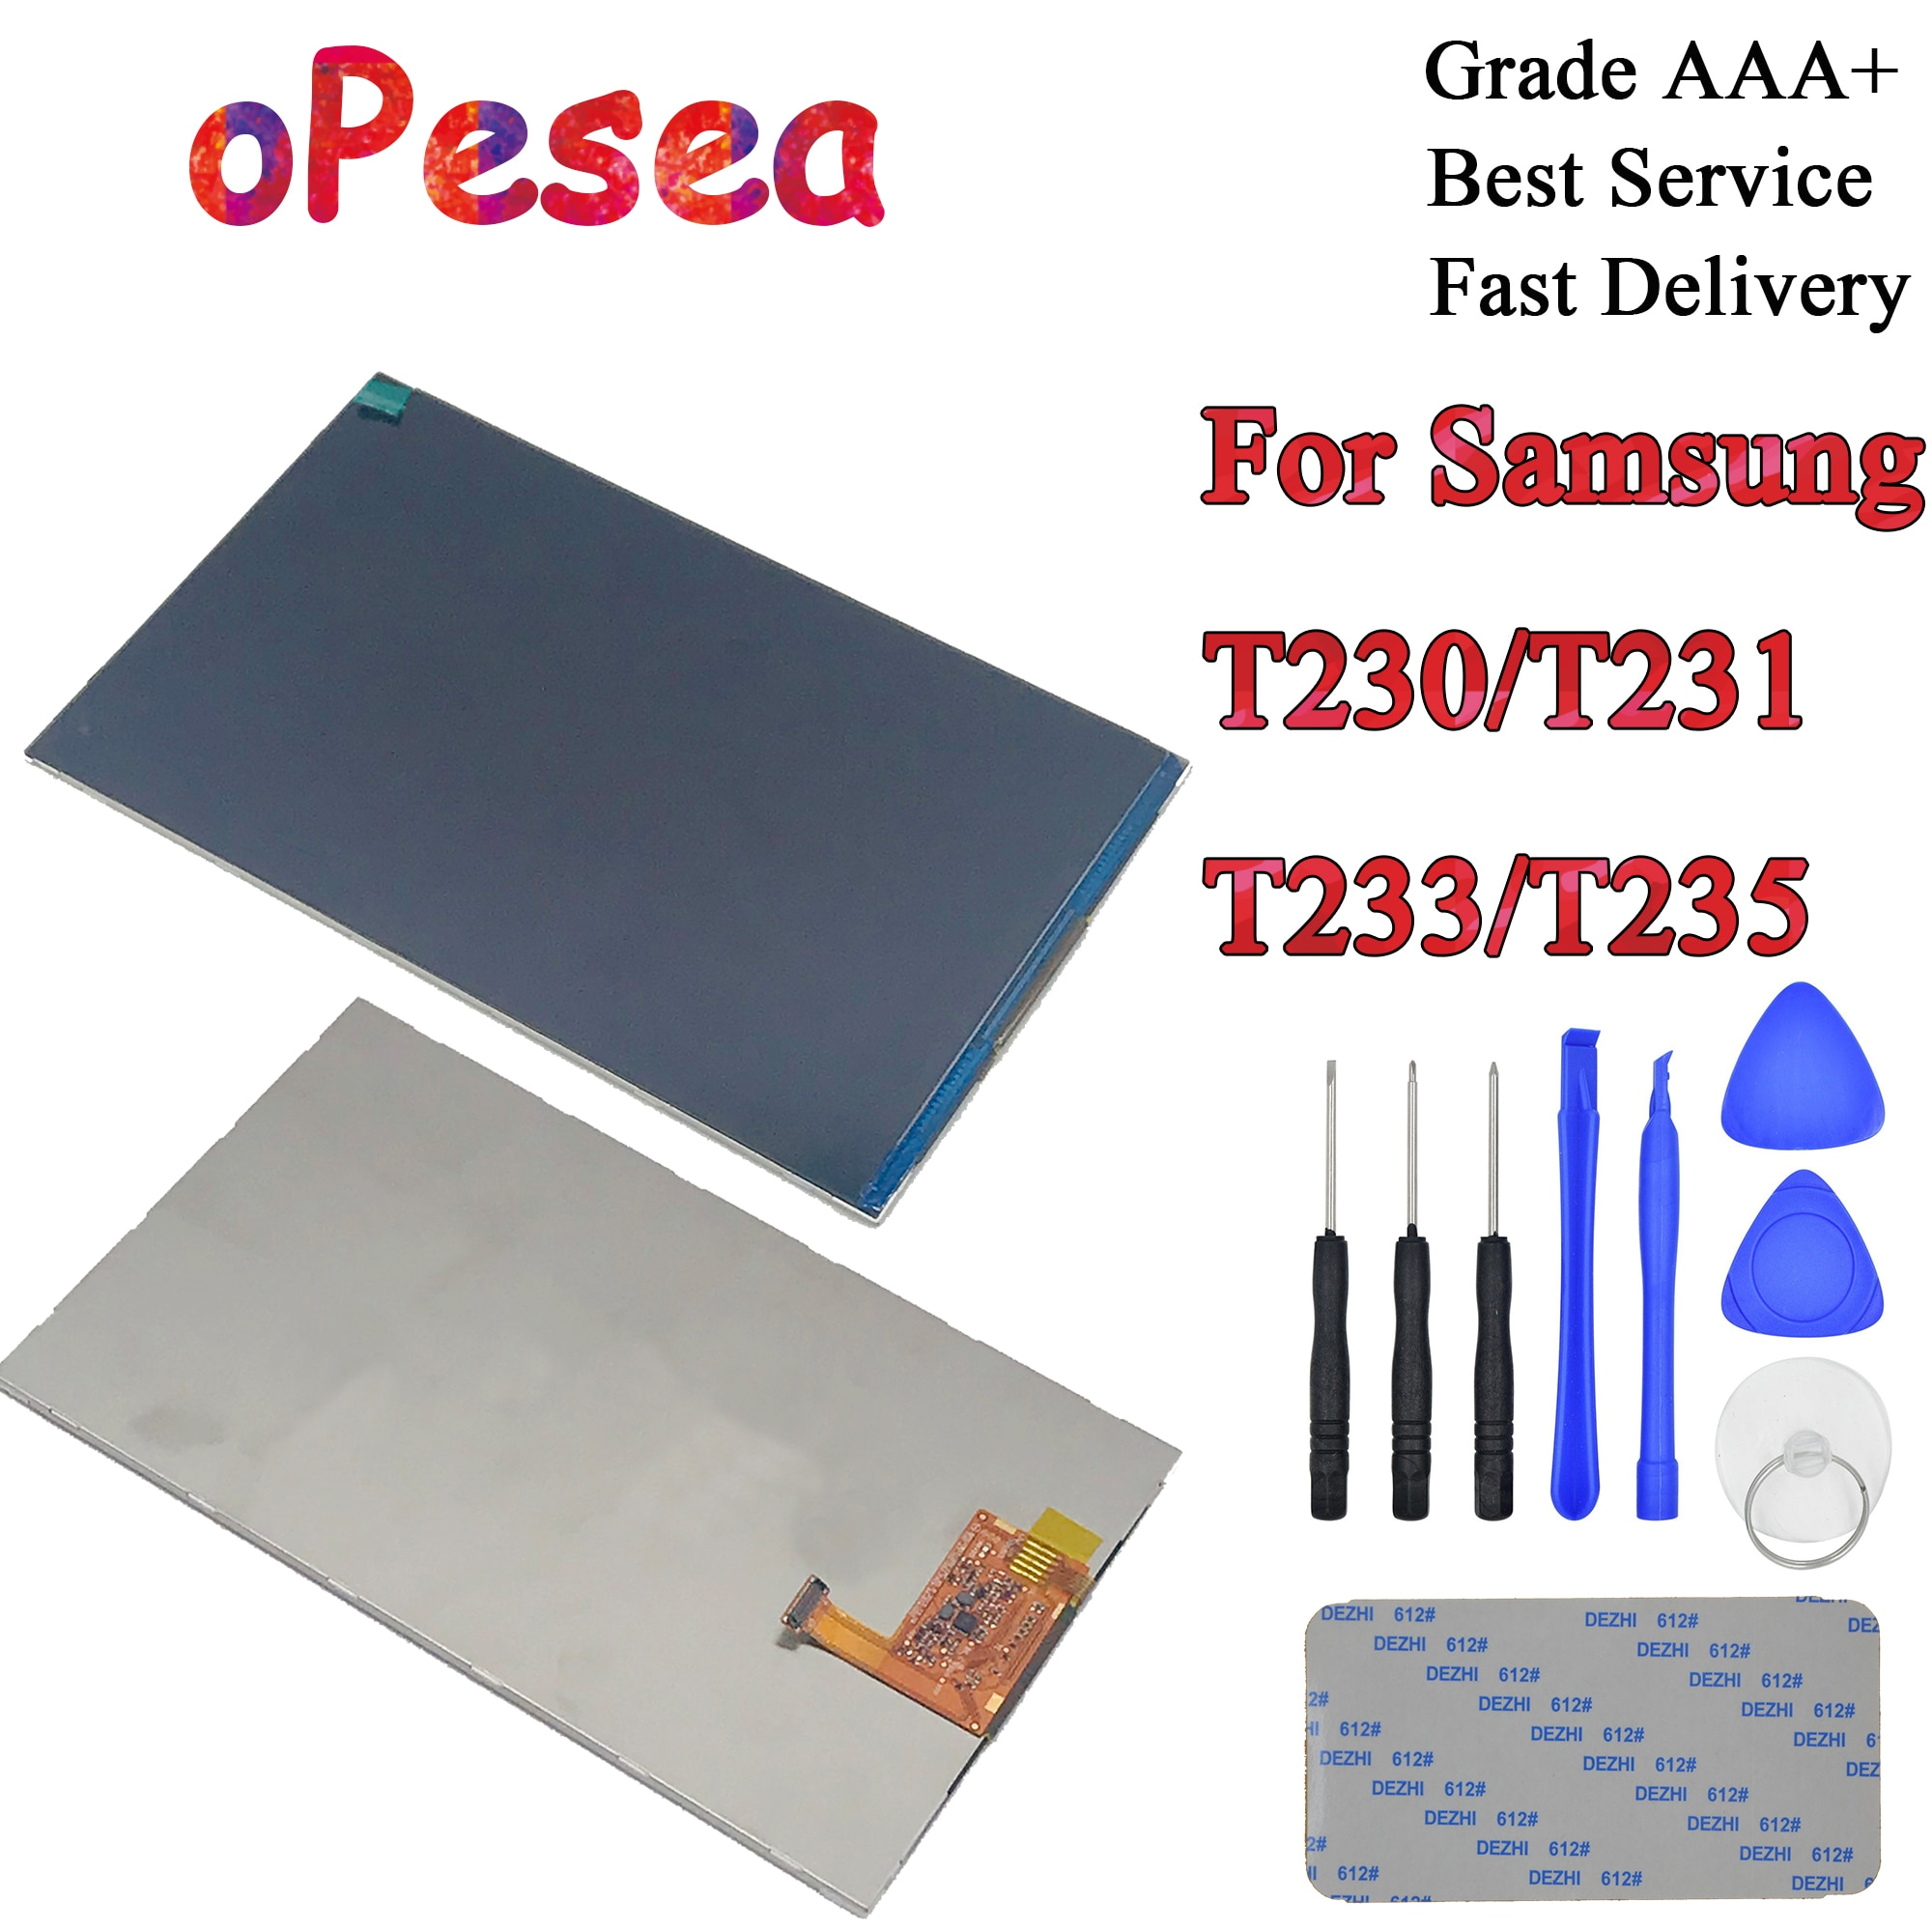 OPesea para Samsung Galaxy Tab 4 7,0 T230 T231 T233 T235 pantalla LCD Monitor piezas de repuesto